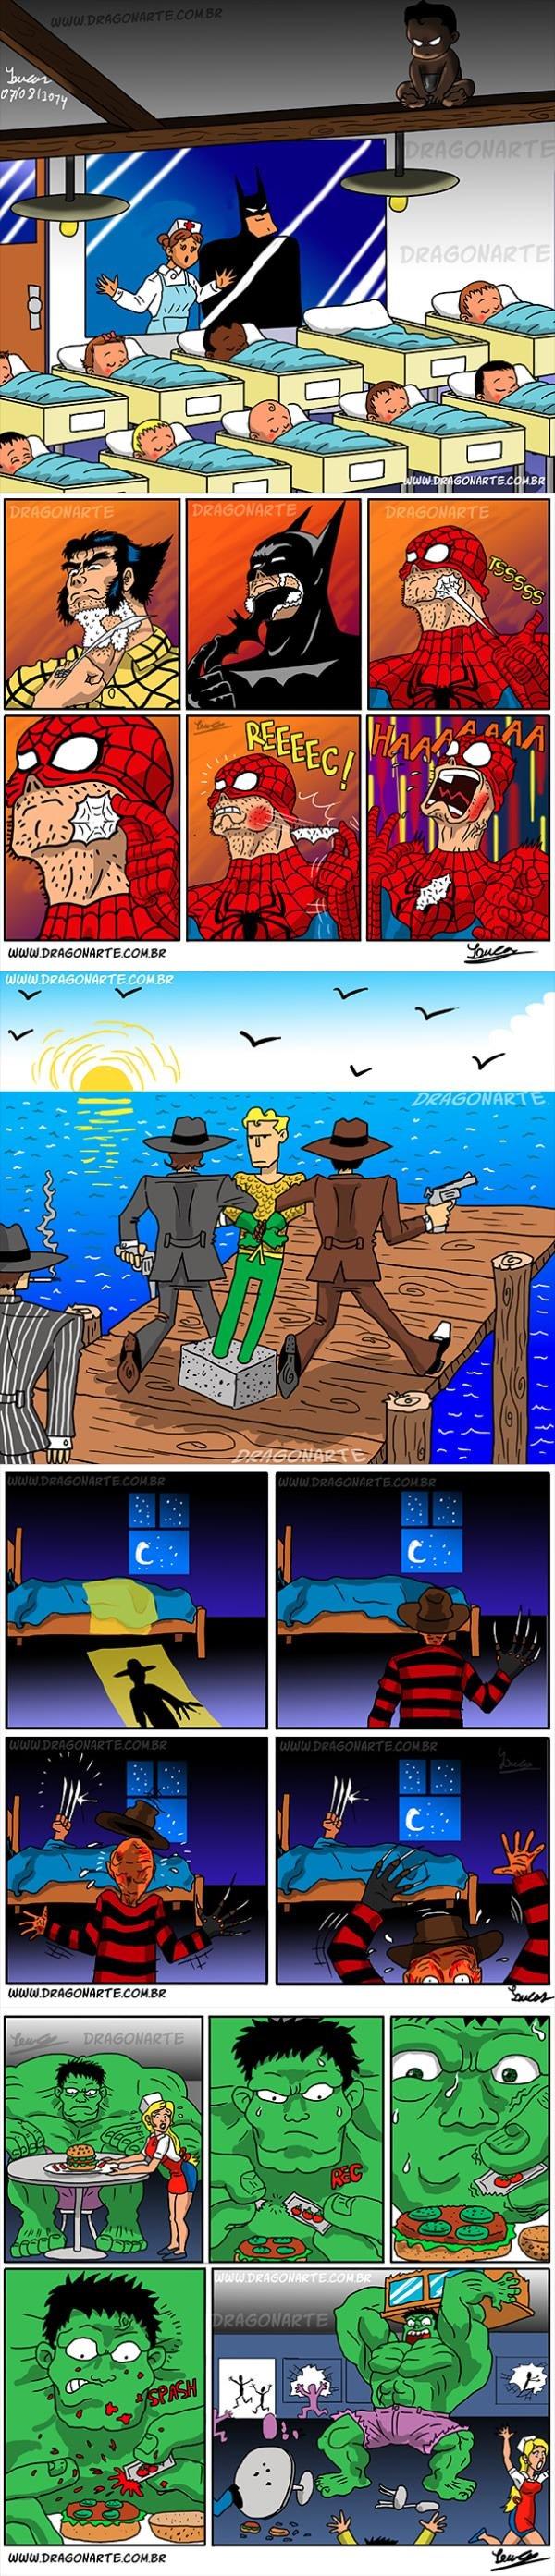 Amazing Superhero Jokes. thanks to dragonwarte.com.br just though i'd share. Superhero batman